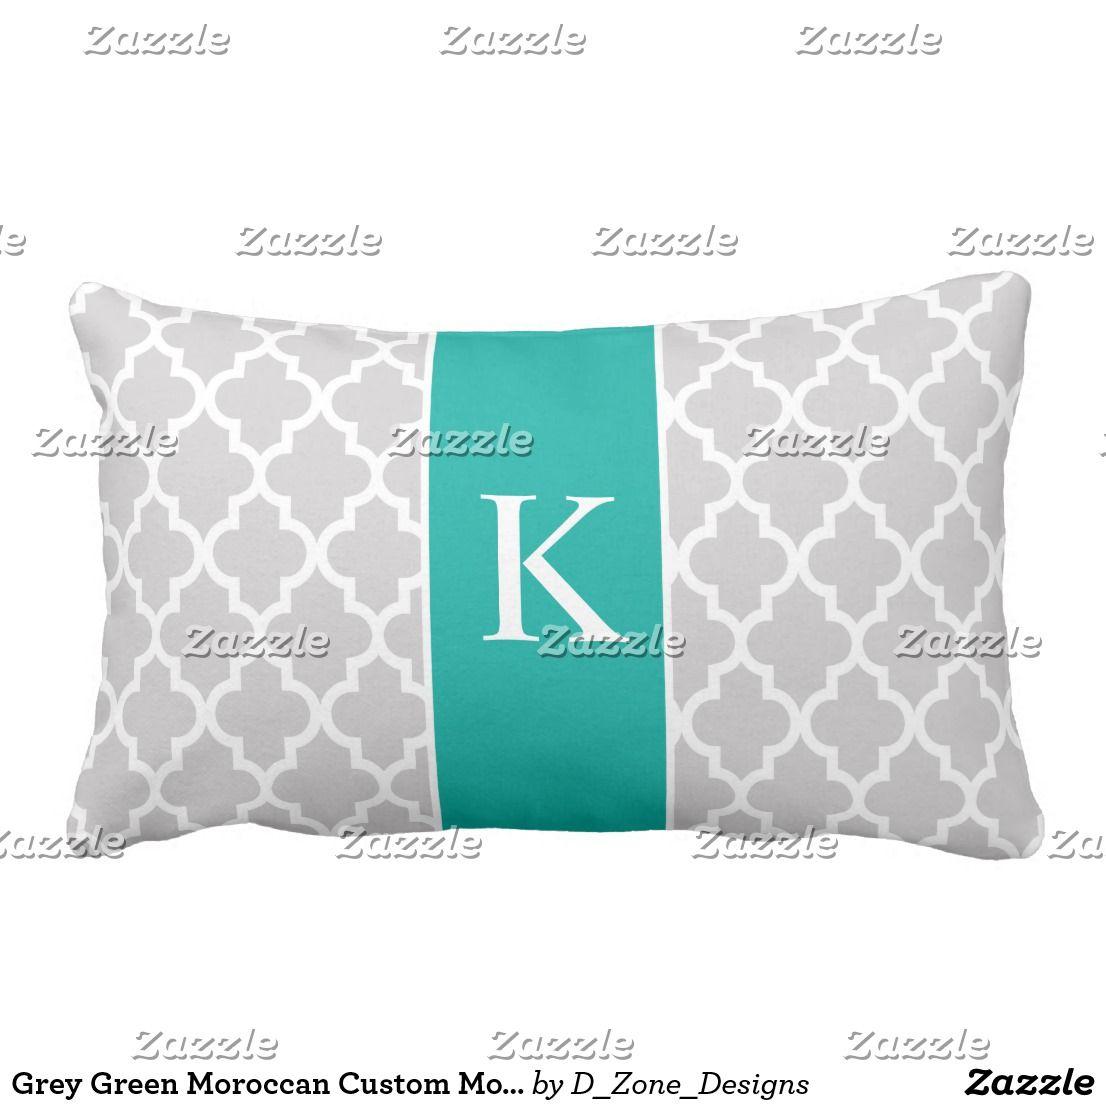 Grey green moroccan custom monogram lumbar pillow nicelooking